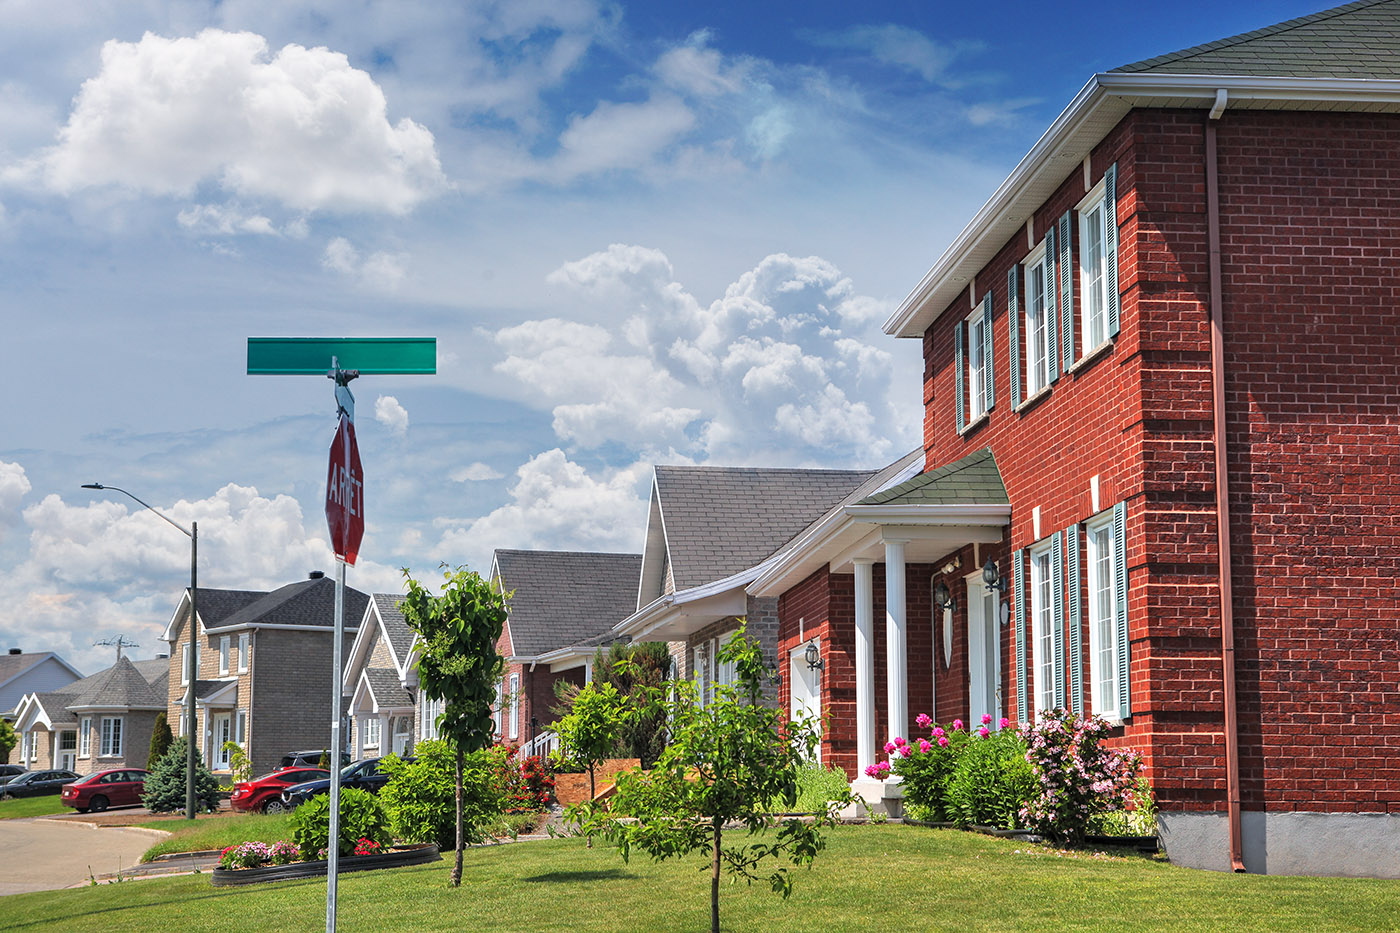 Quiet Neighborhood - Royalty-Free Stock Imagery